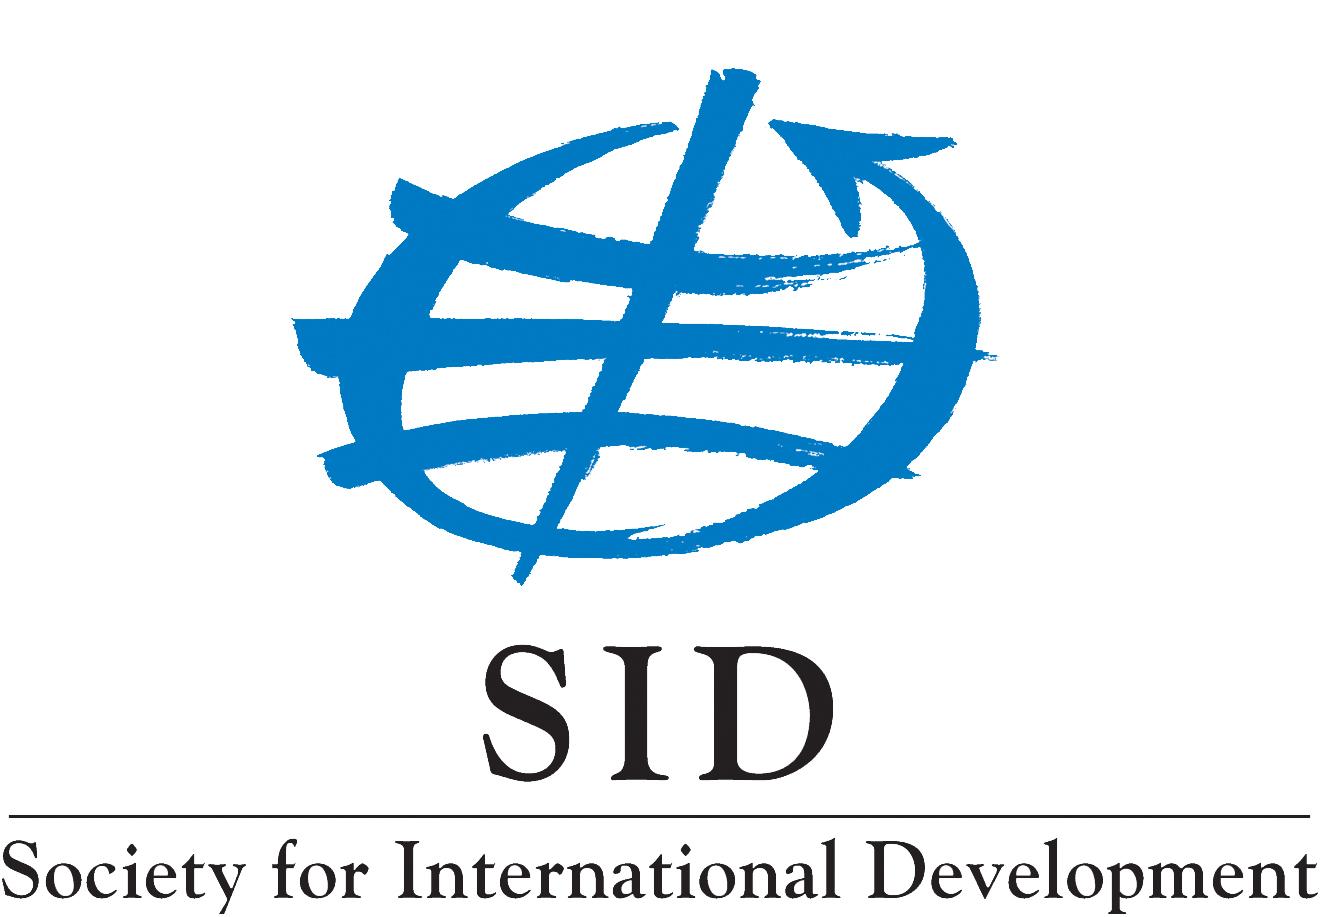 Society for international develoment